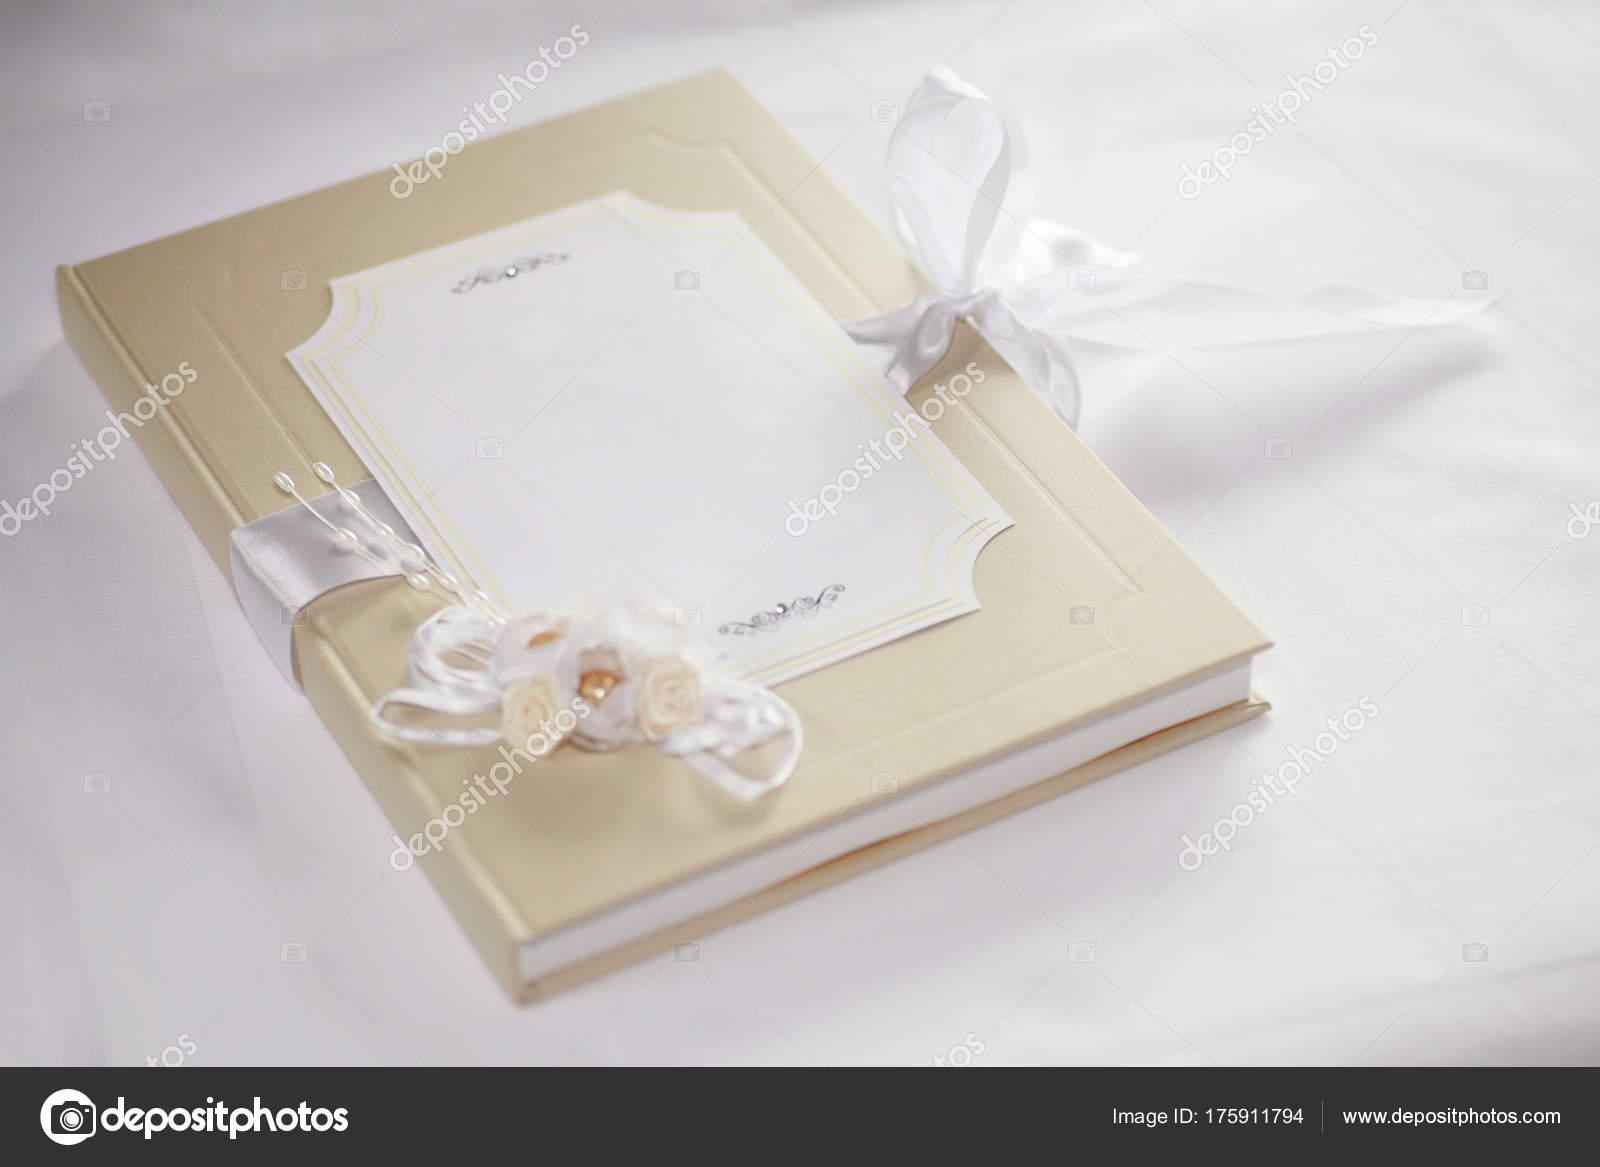 blanc wedding guest book — Stock Photo © v-strelok #175911794